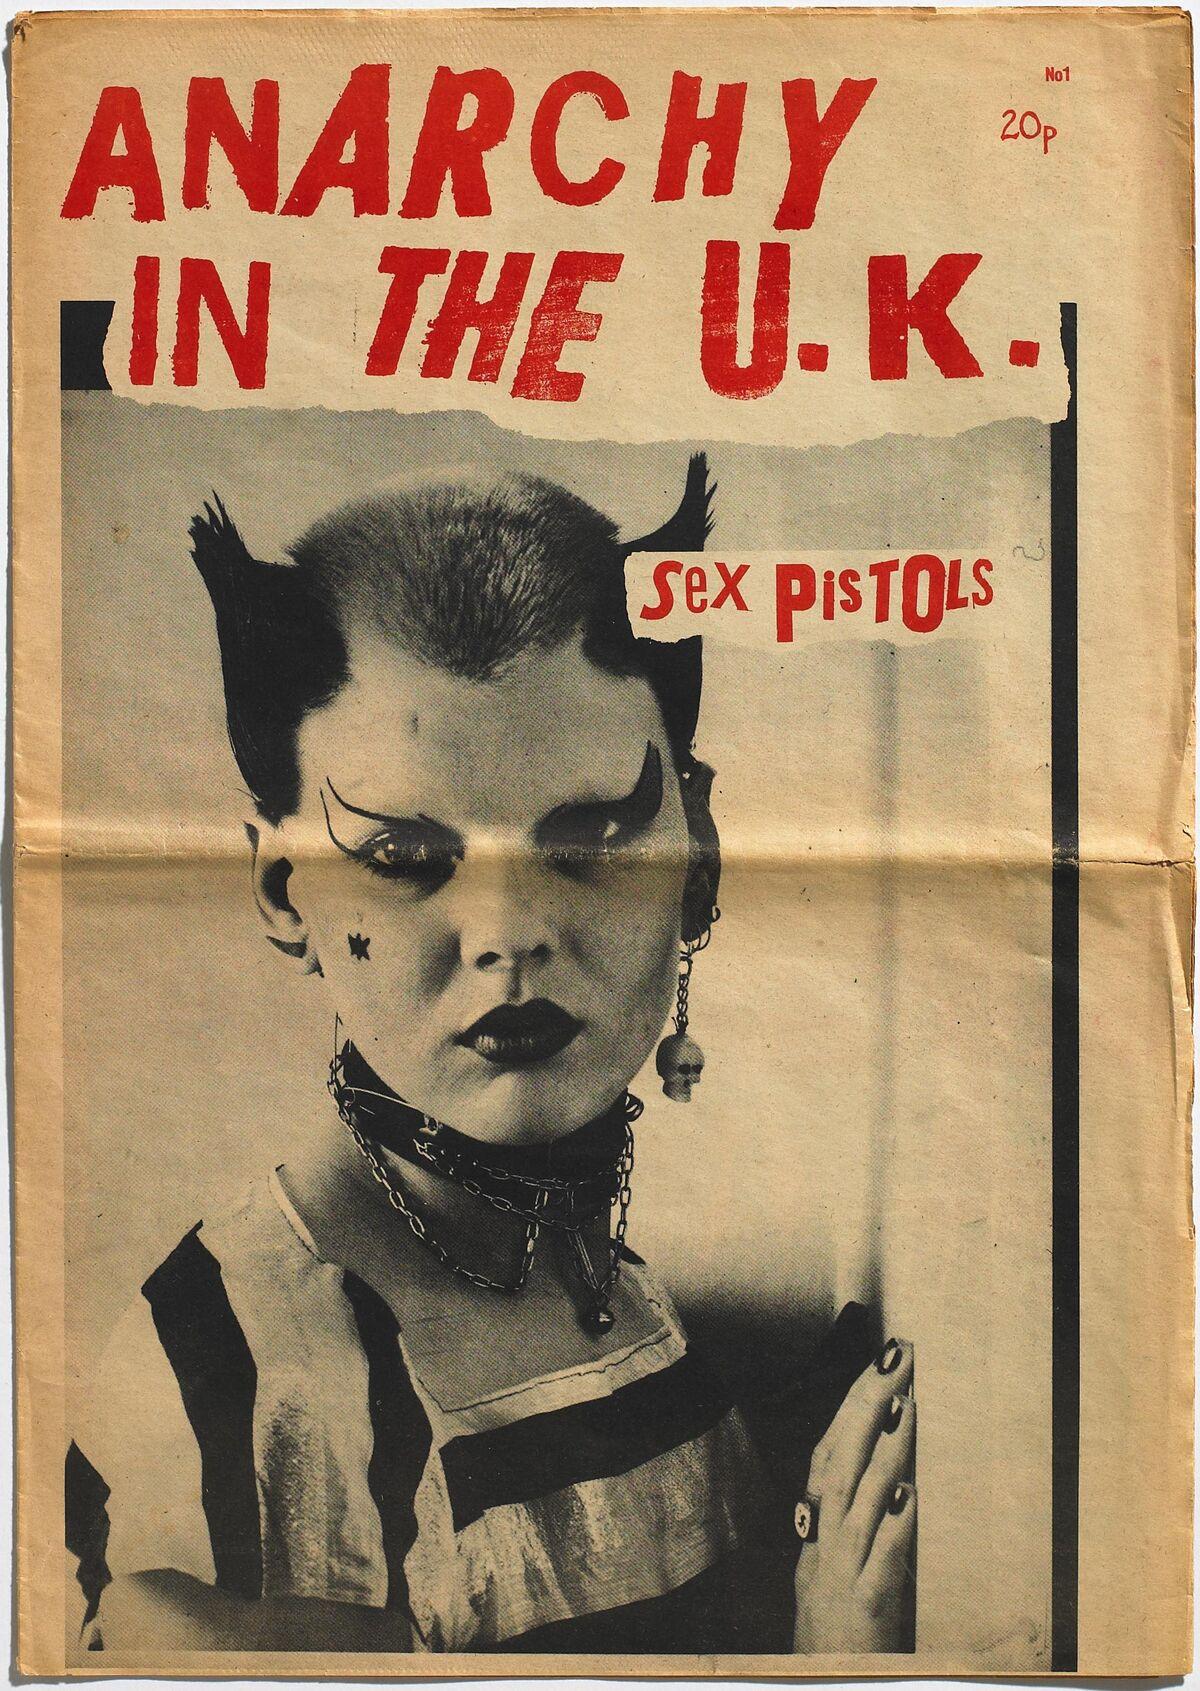 Sex Pistols: Anarchy in the U.K., No. 1, fanzine, Glitterbest, 1976. Courtesy of Toby Mott/Mott Collection, London.